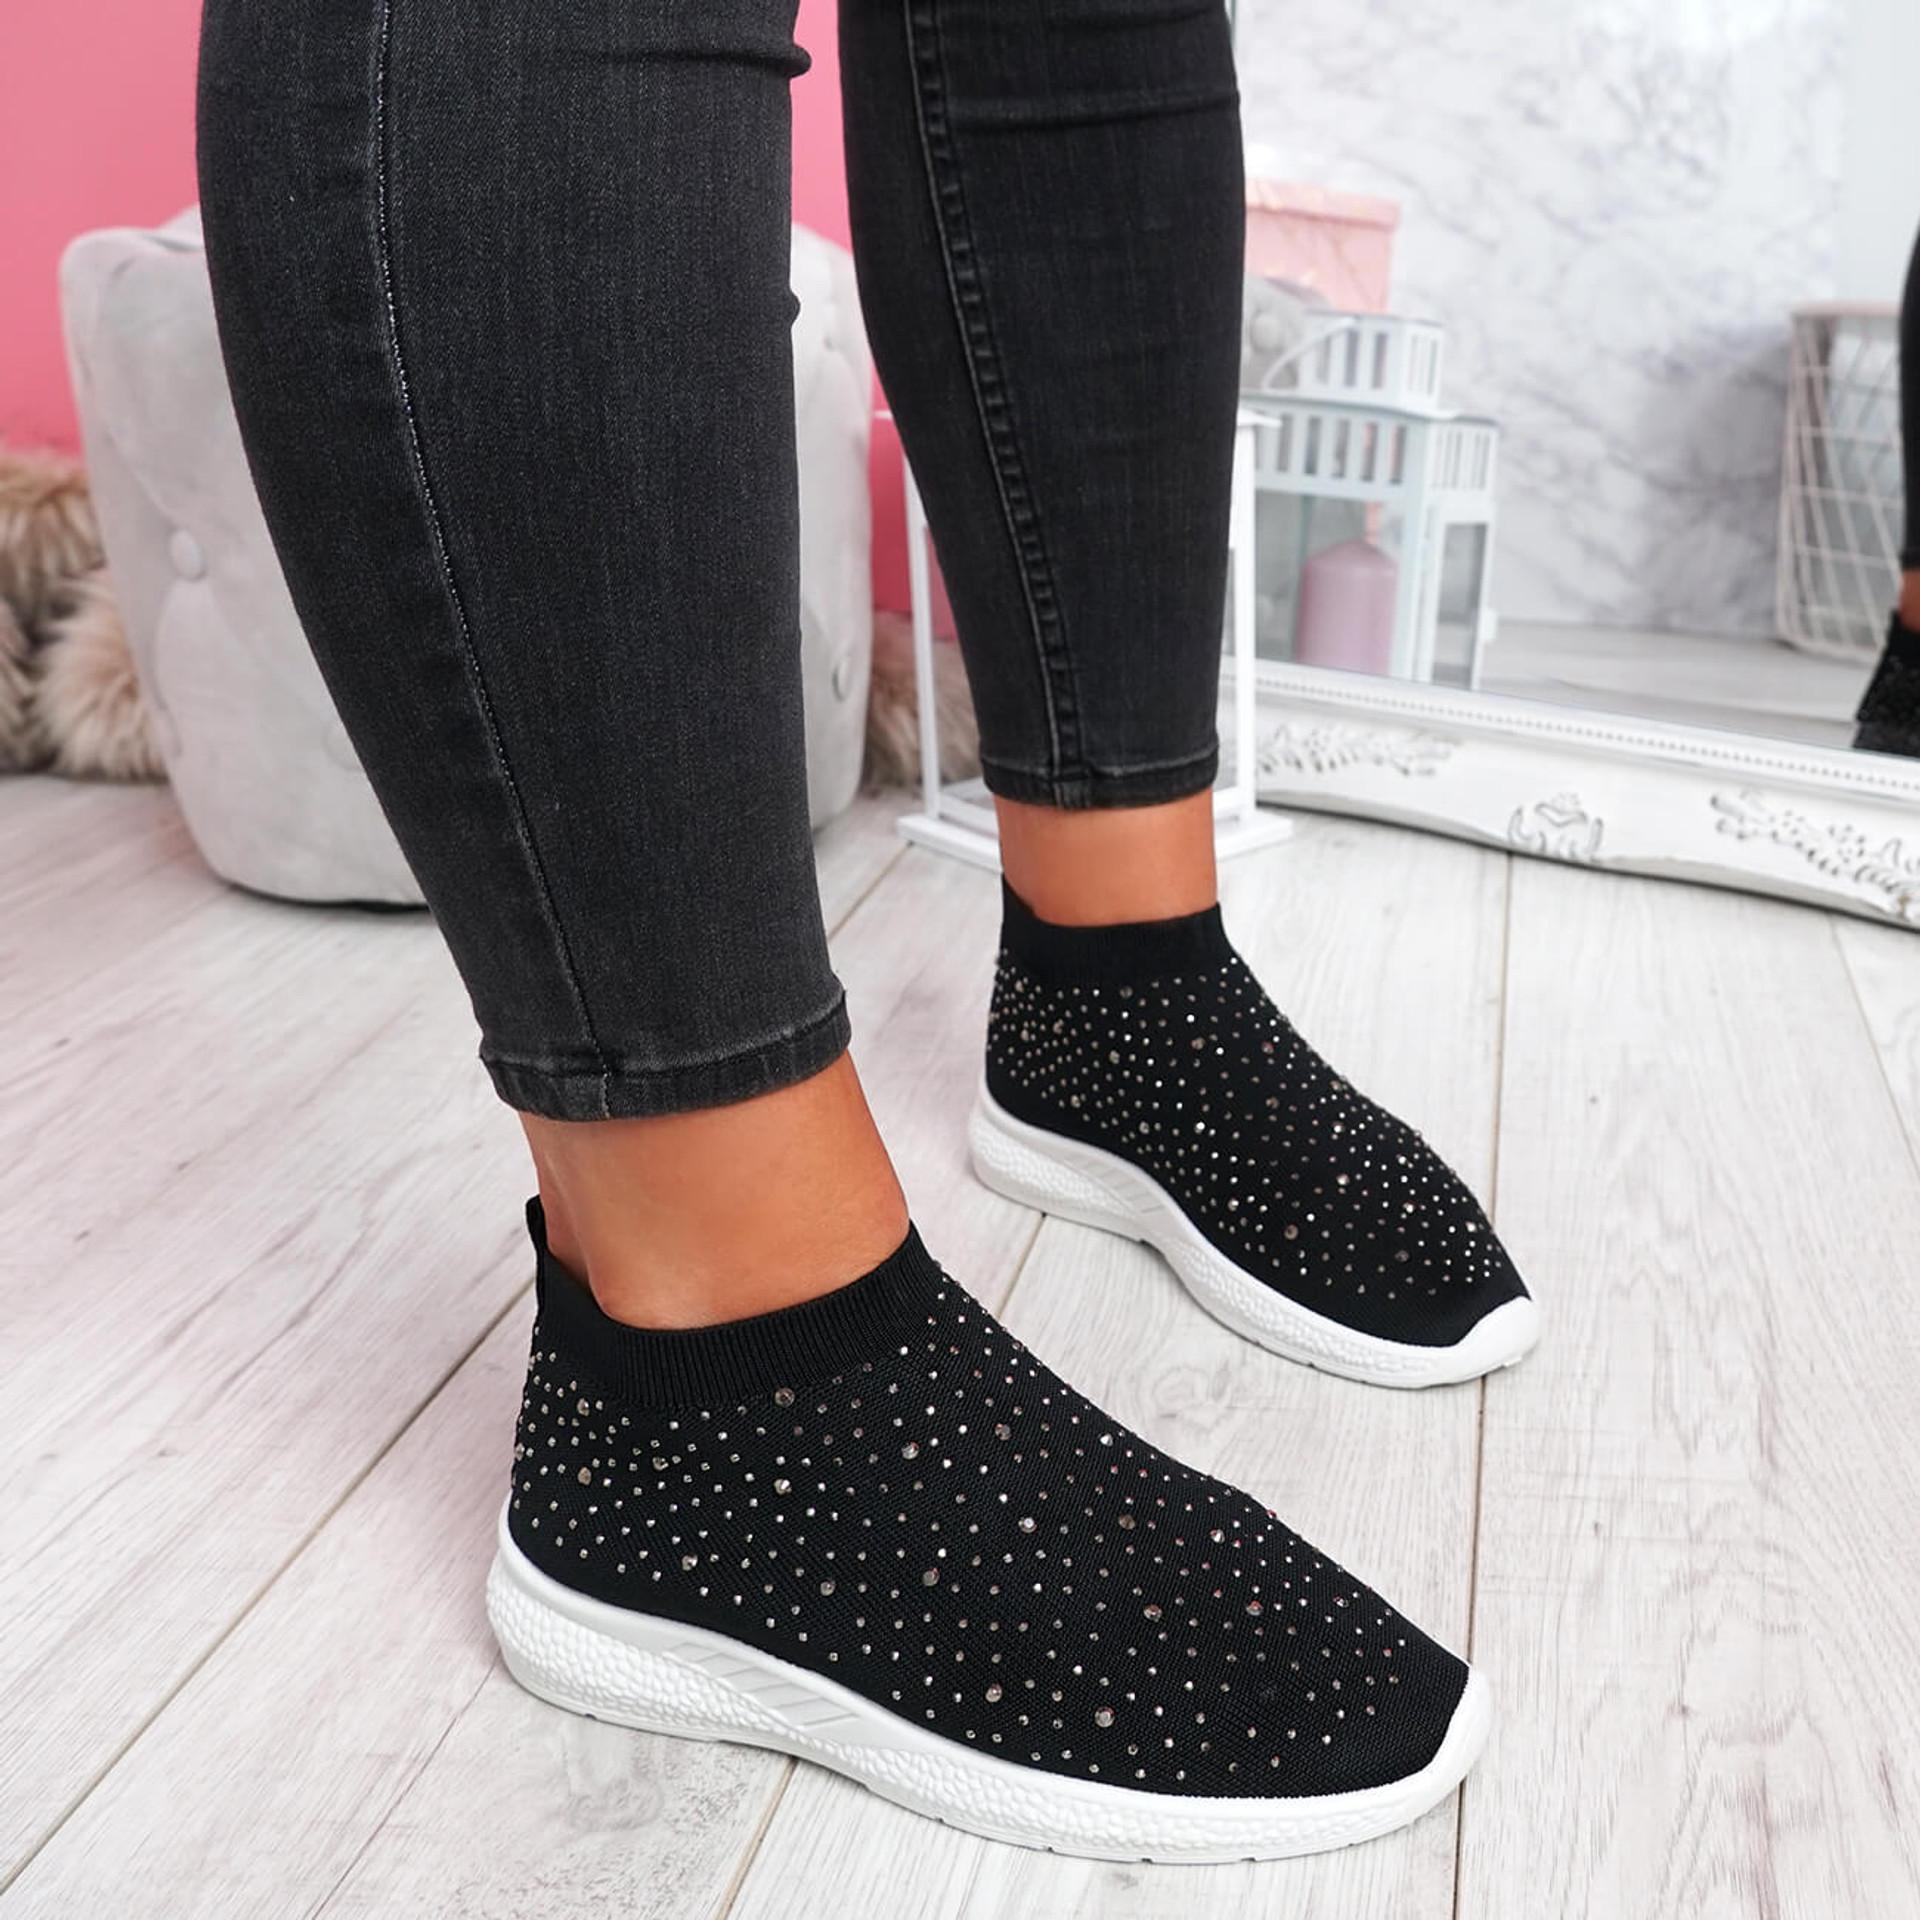 Jutty Black Studded Sock Sneakers